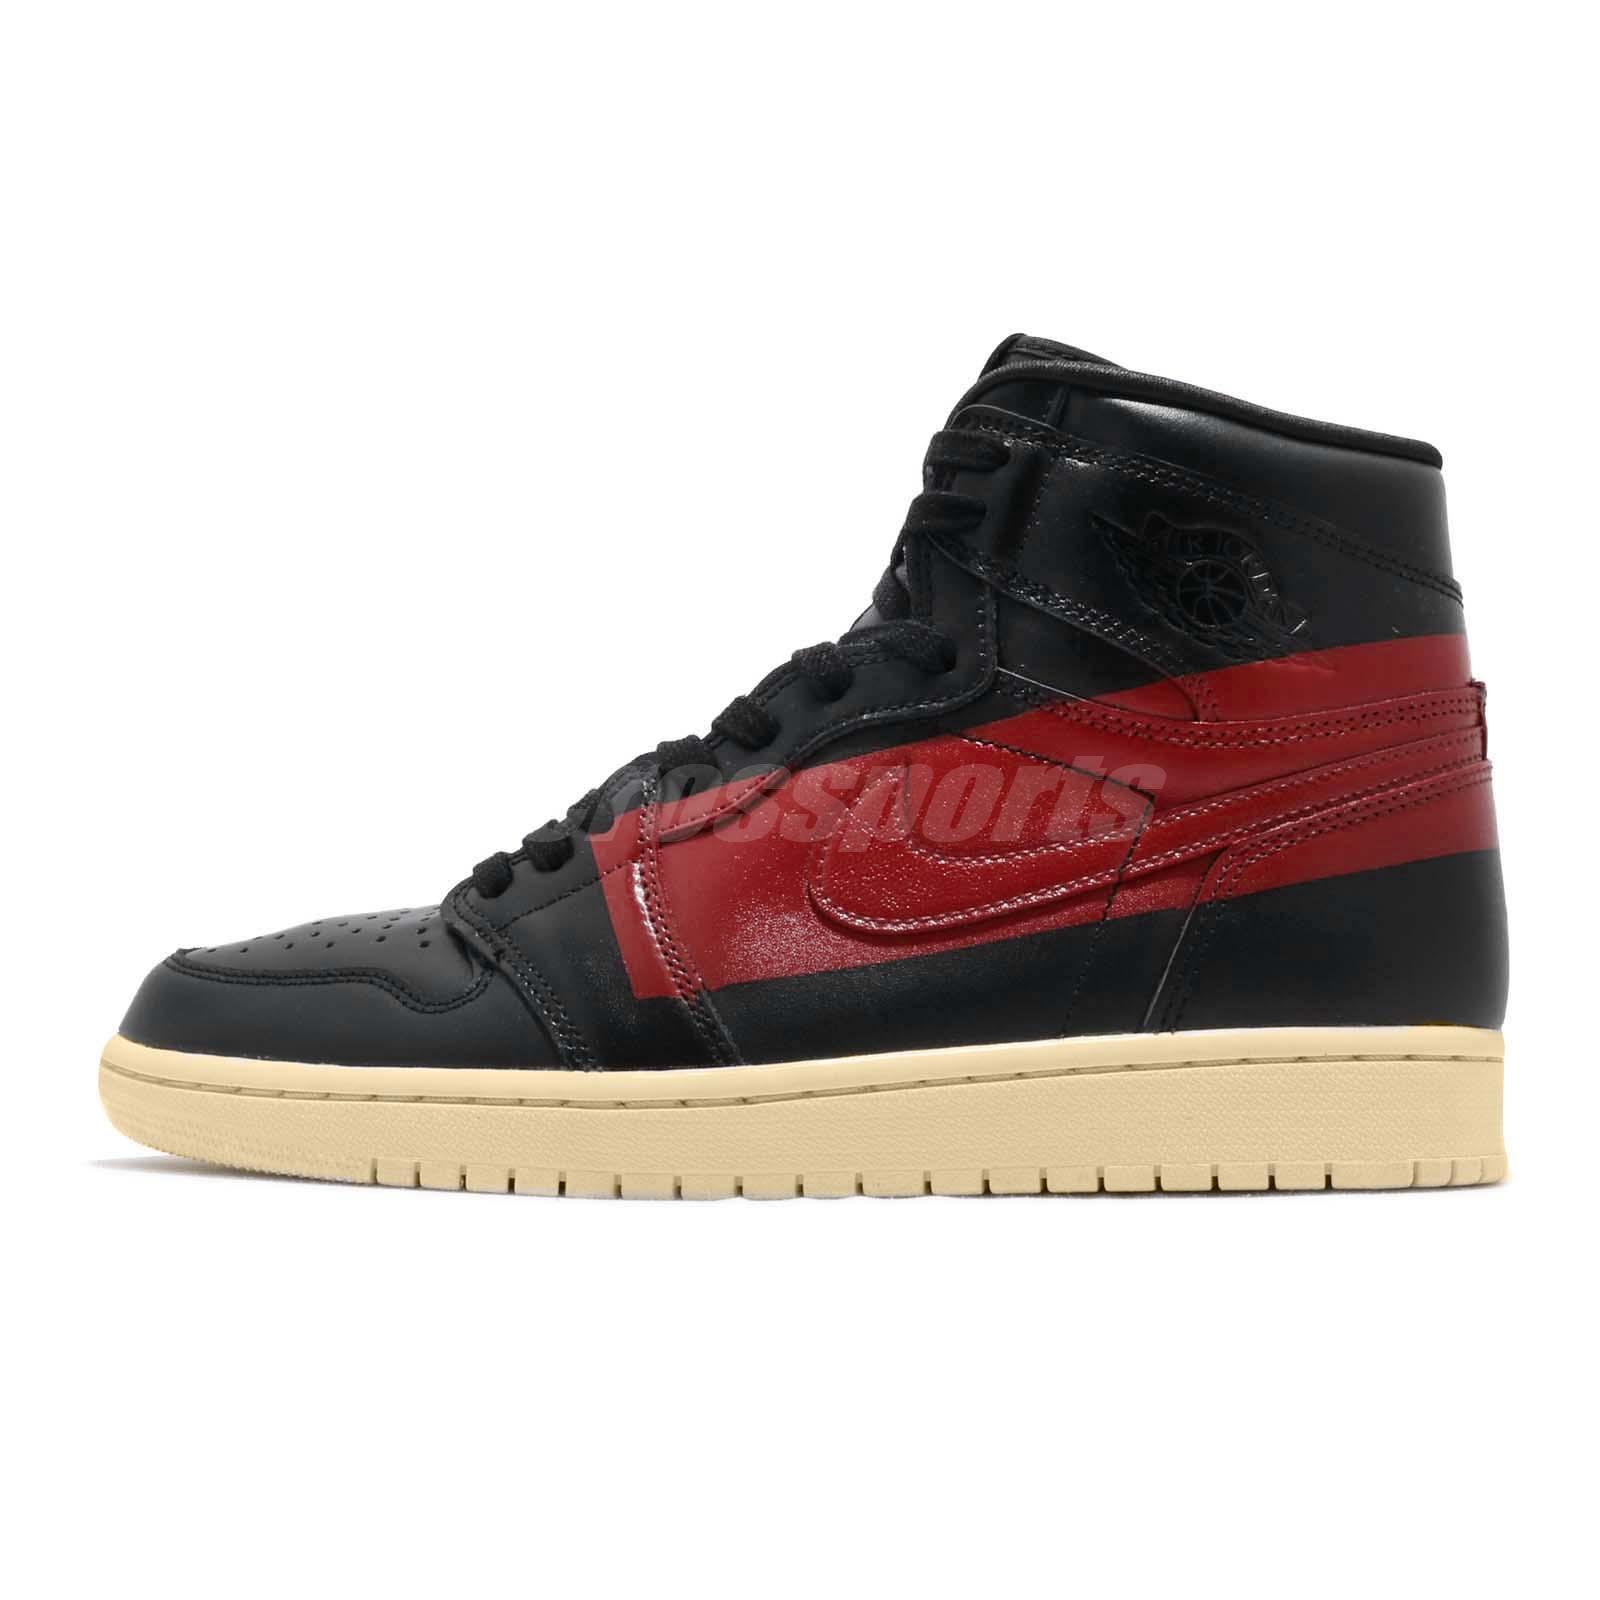 e73e490c3c537a Nike Air Jordan 1 Retro High OG Defiant Couture Black Red Bred Banned  BQ6682-006